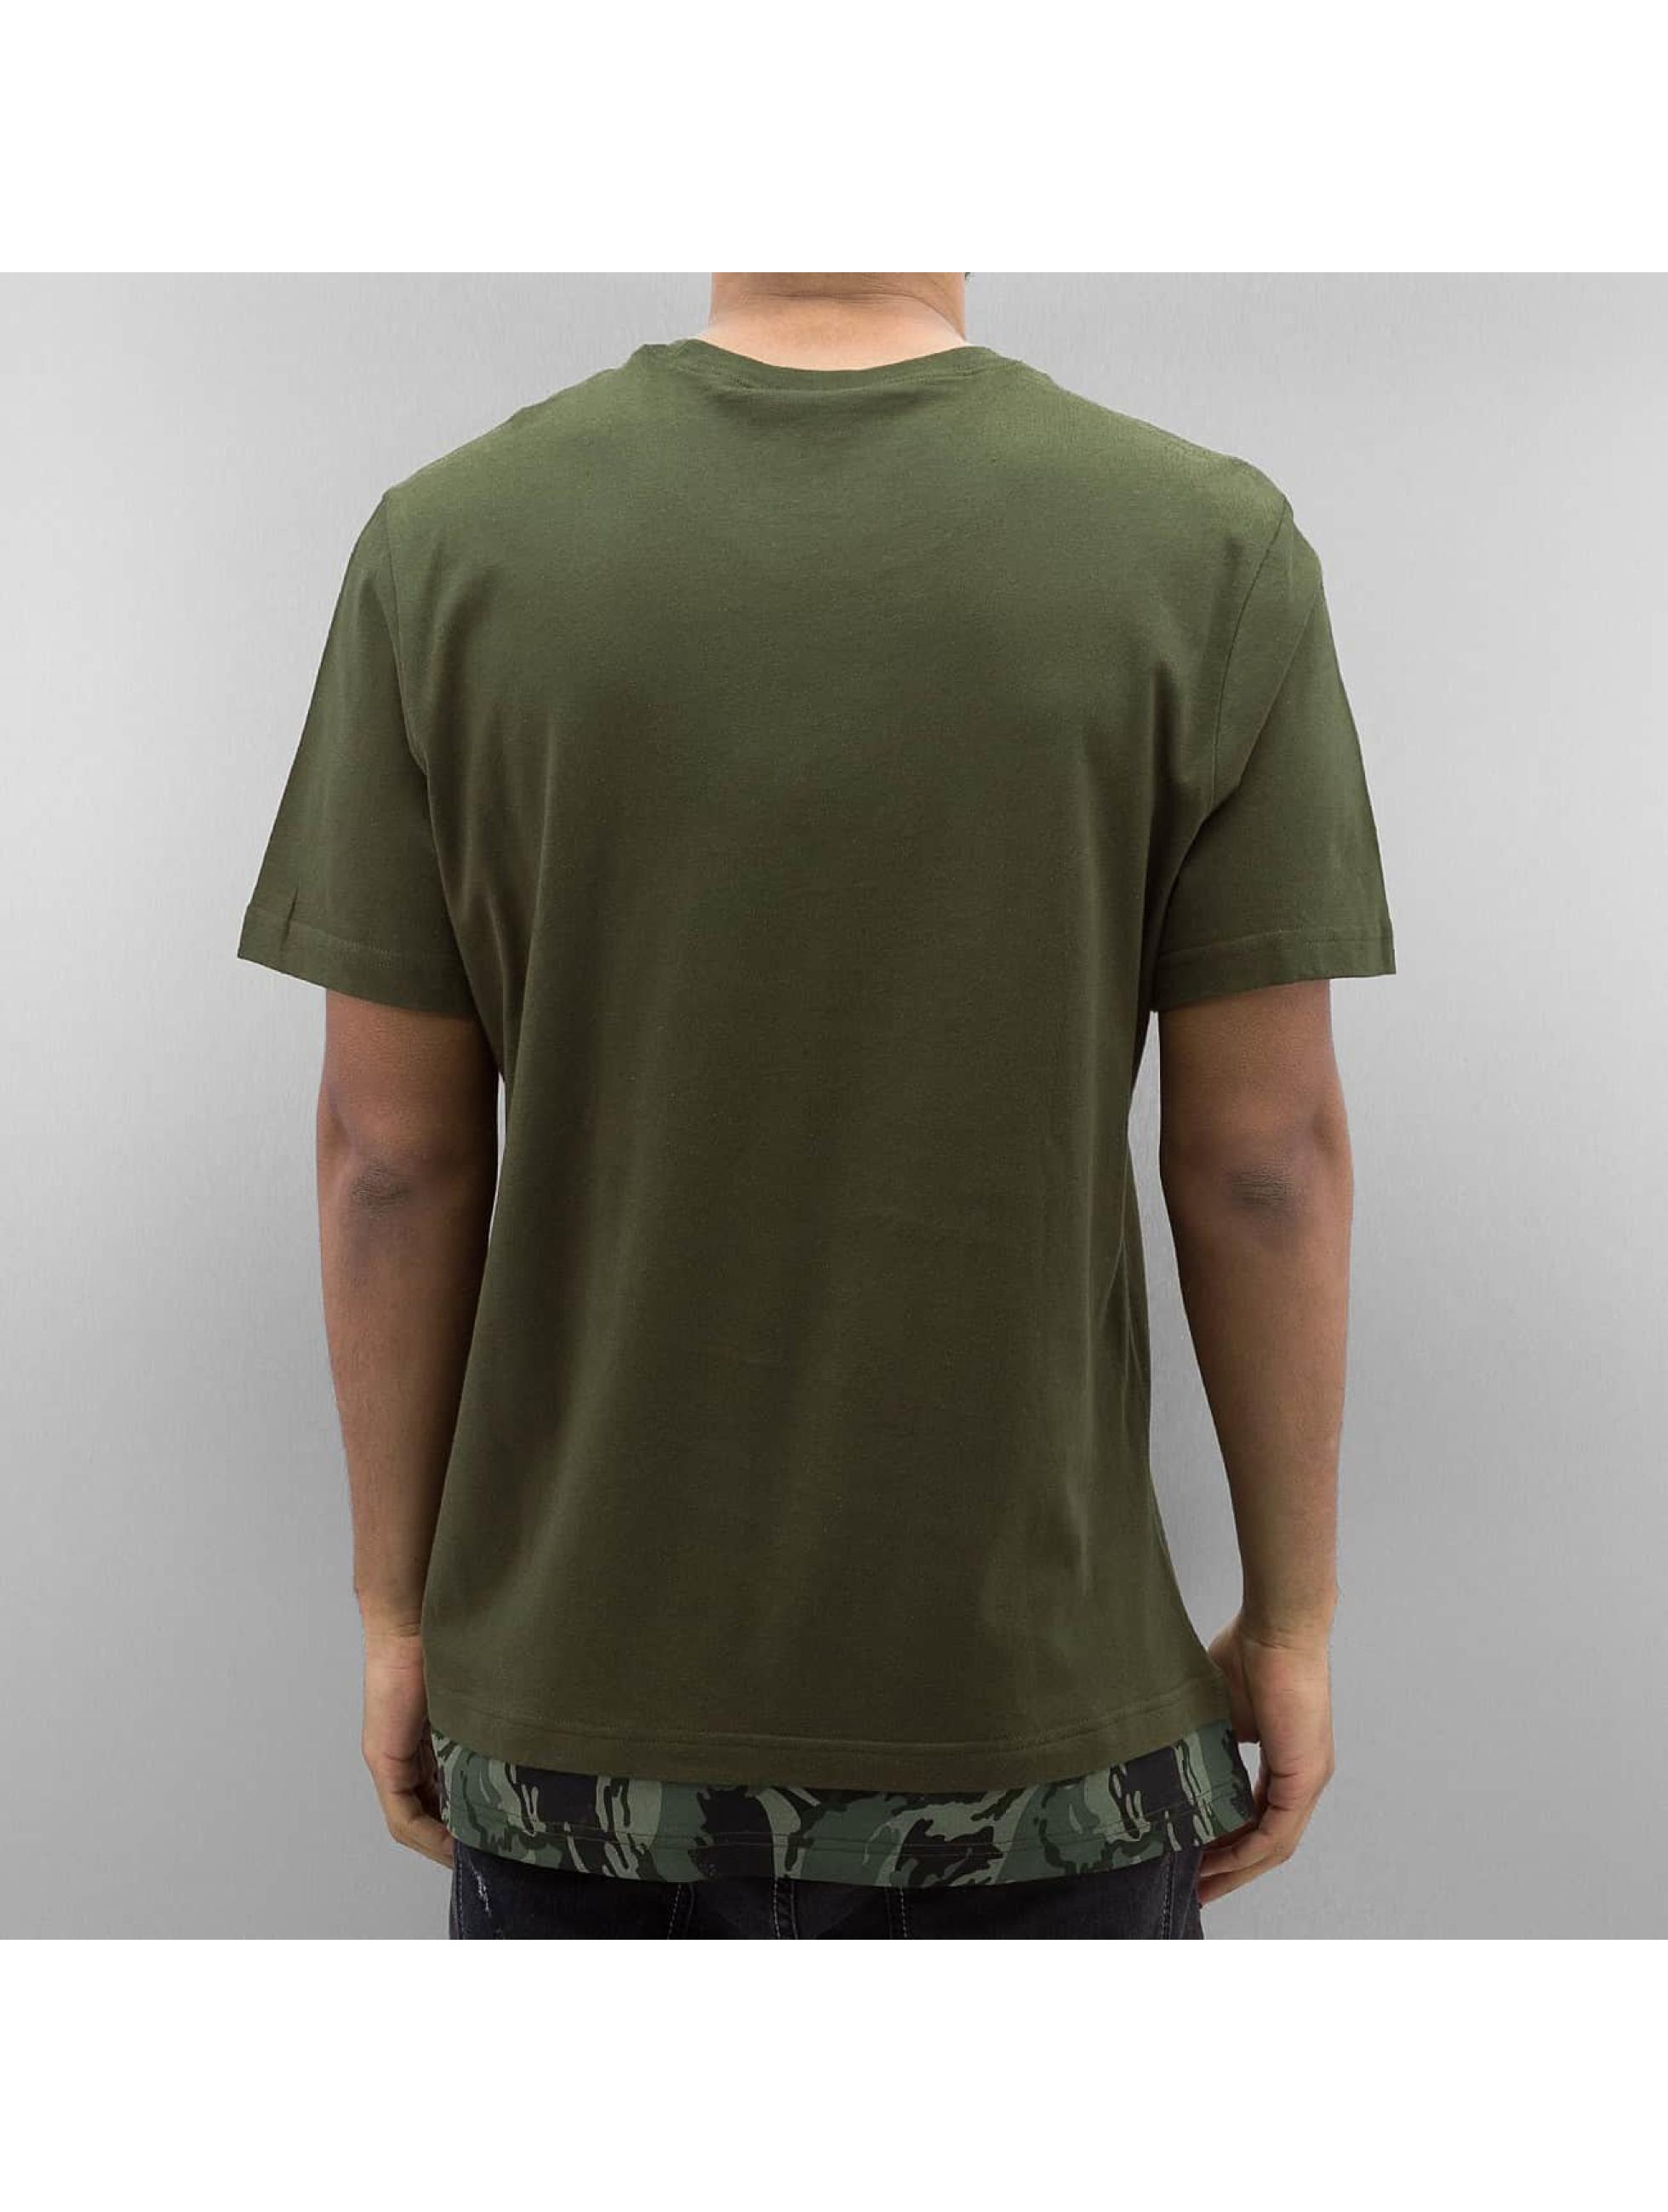 Reebok T-Shirt Layered green